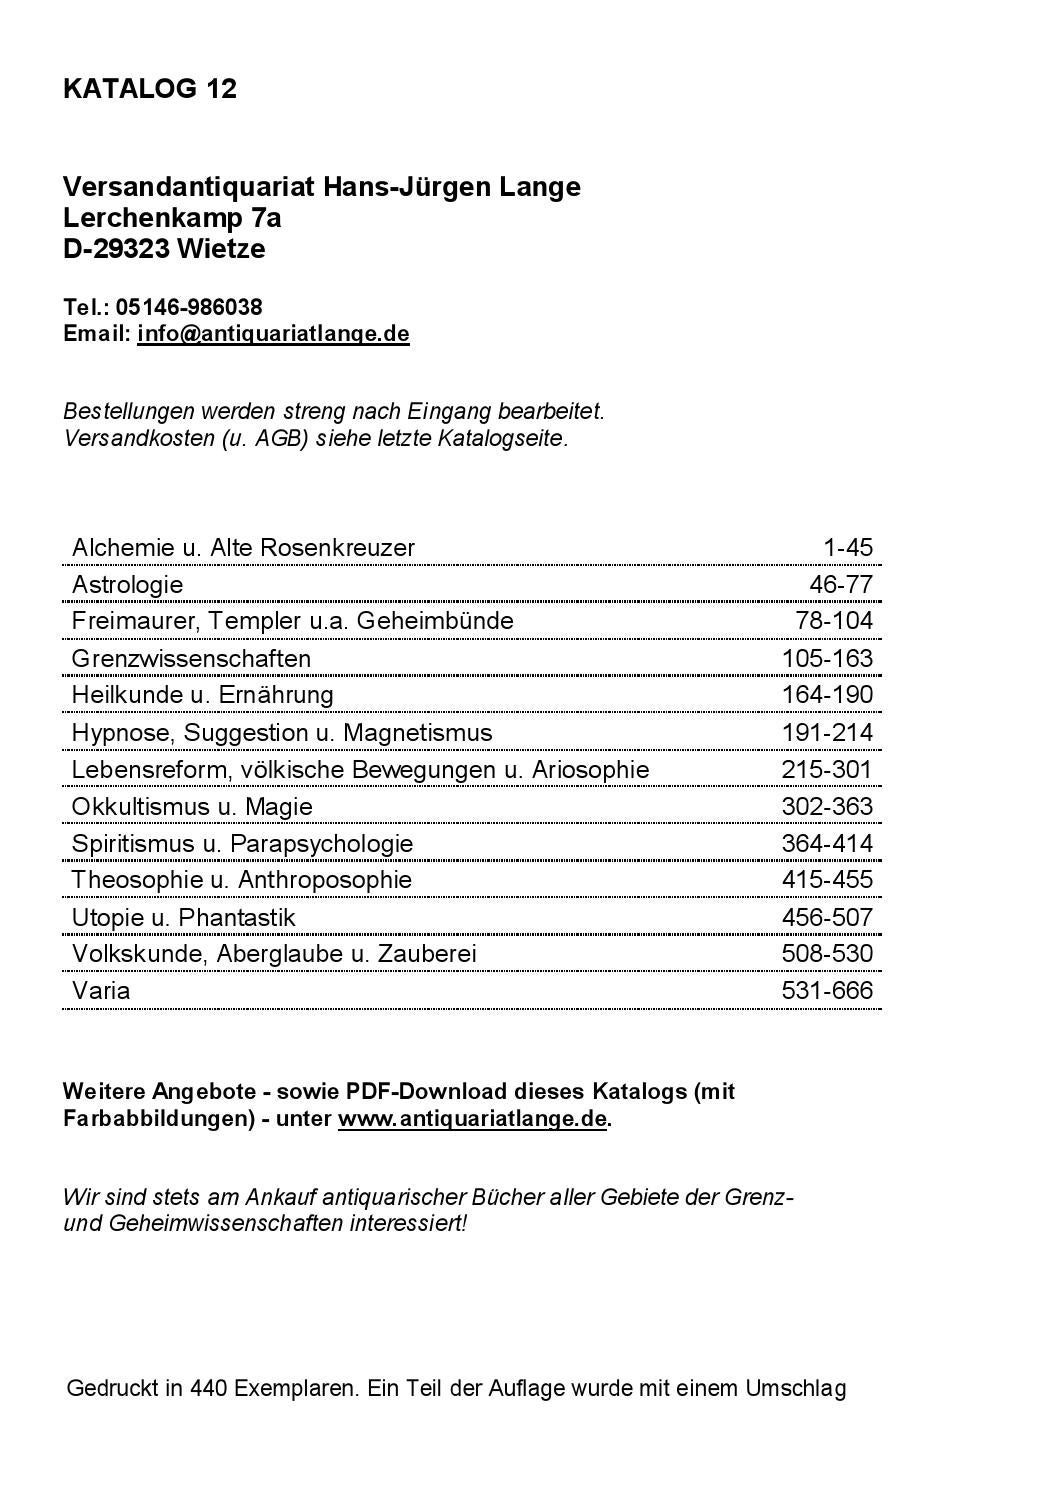 Katalog 12 - Versandantiquariat Hans-Jürgen Lange by Versandantiquariat  Hans-Jürgen Lange - issuu